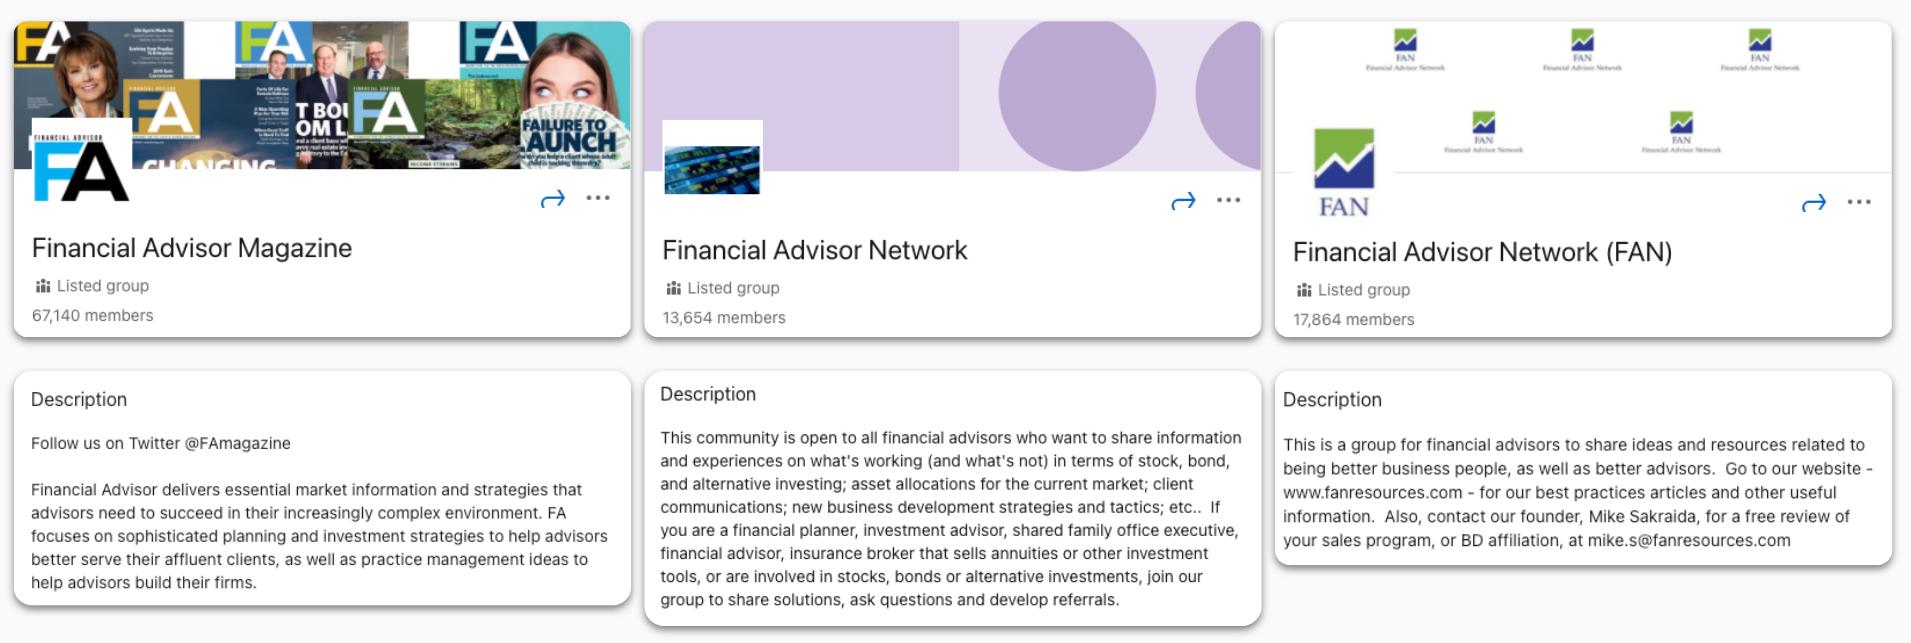 Linkedin - Financial Advisor Magazine